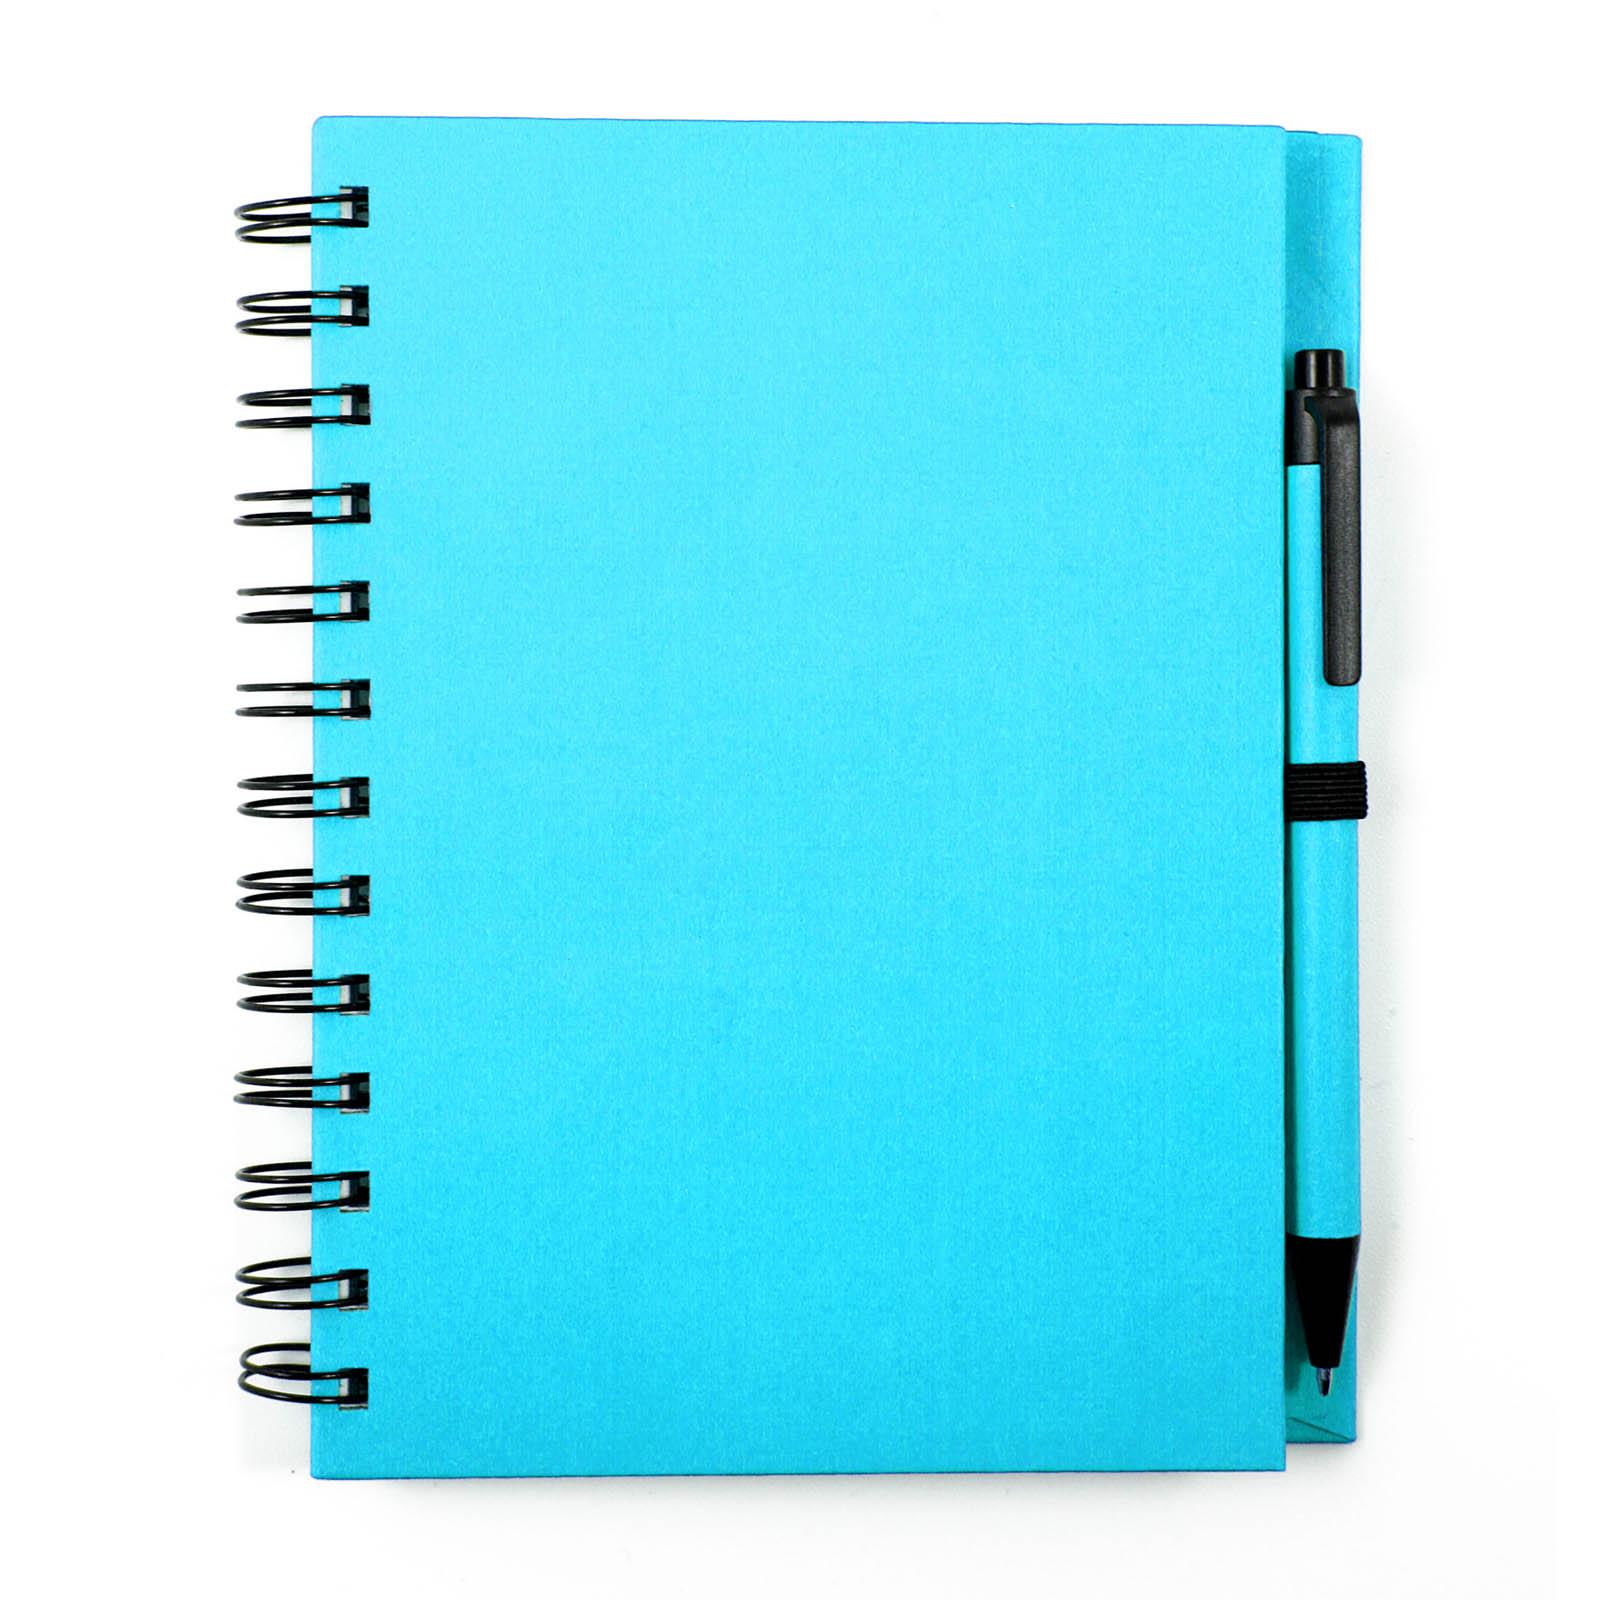 carnet-elsy-becgo1211-bleu